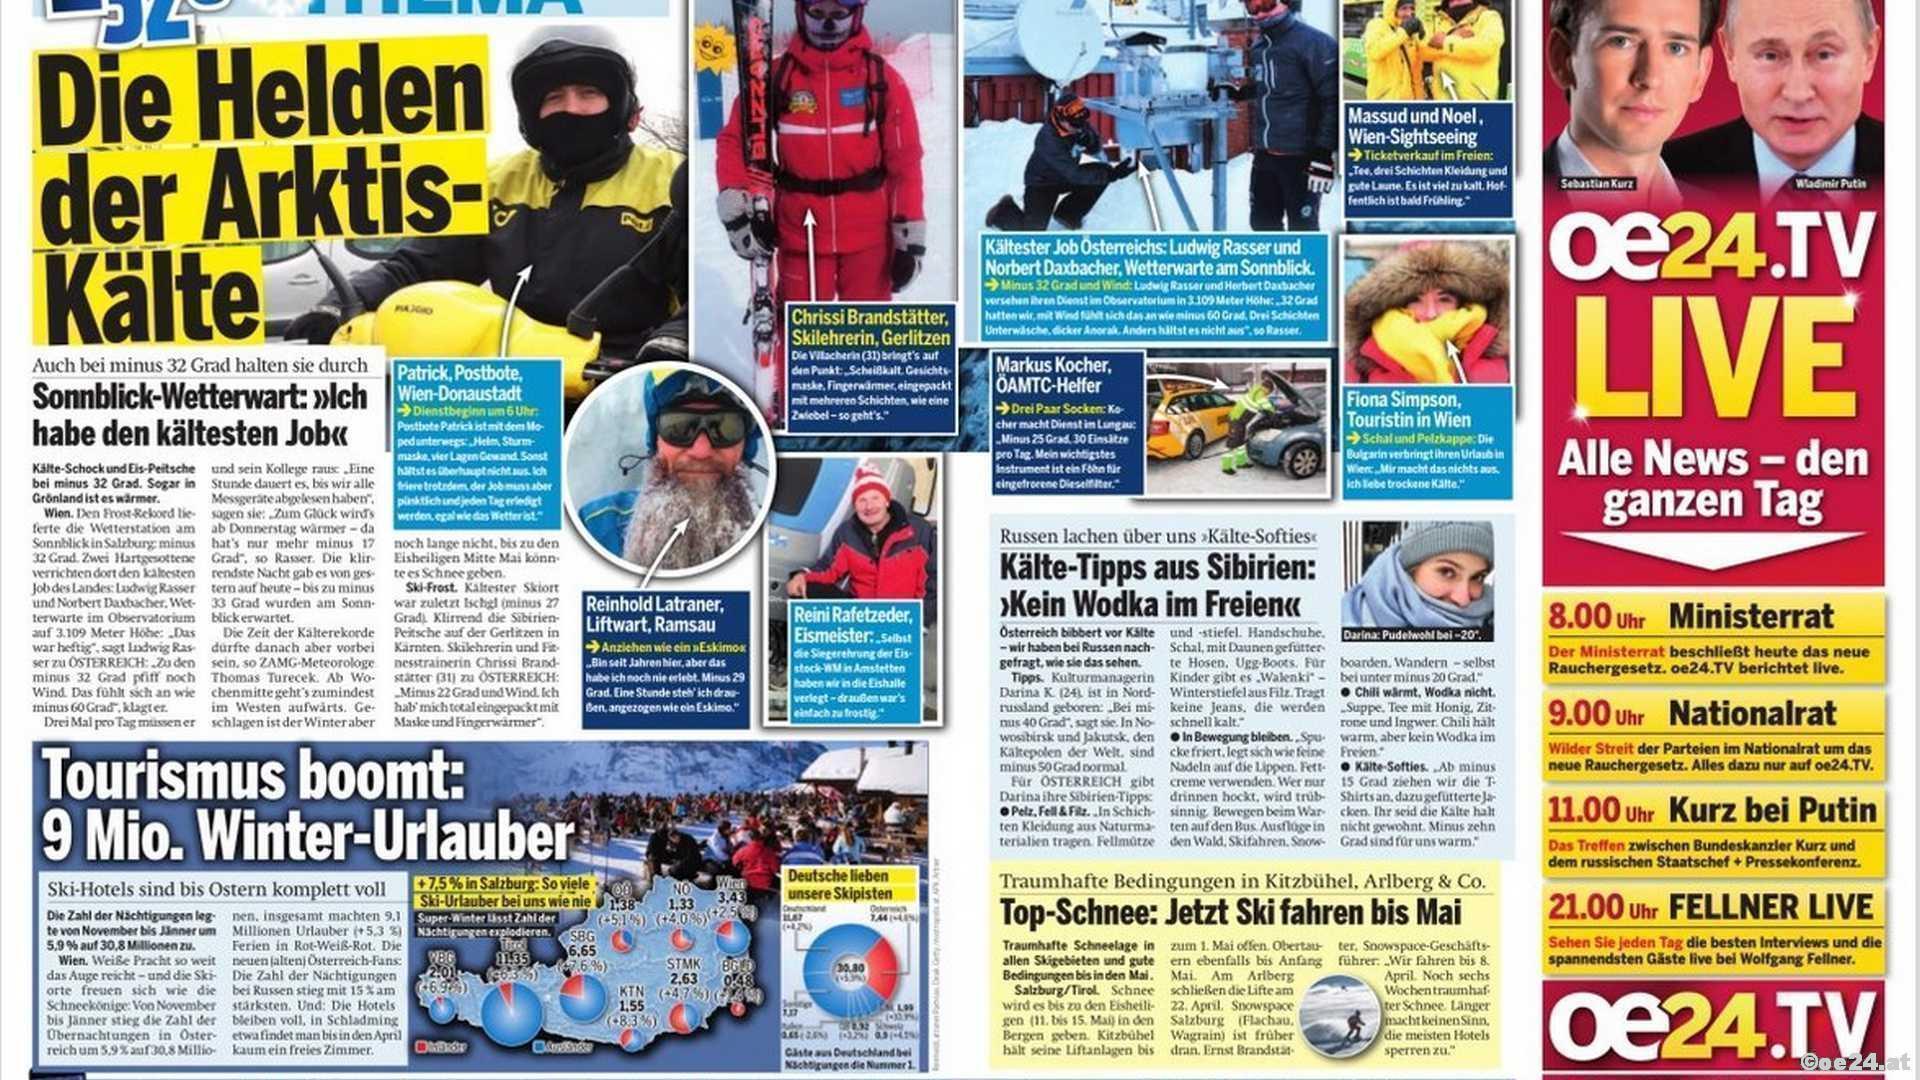 Arktis-Kälte Eiskalt Skifahren Skilehrer Arbeitn im Freien